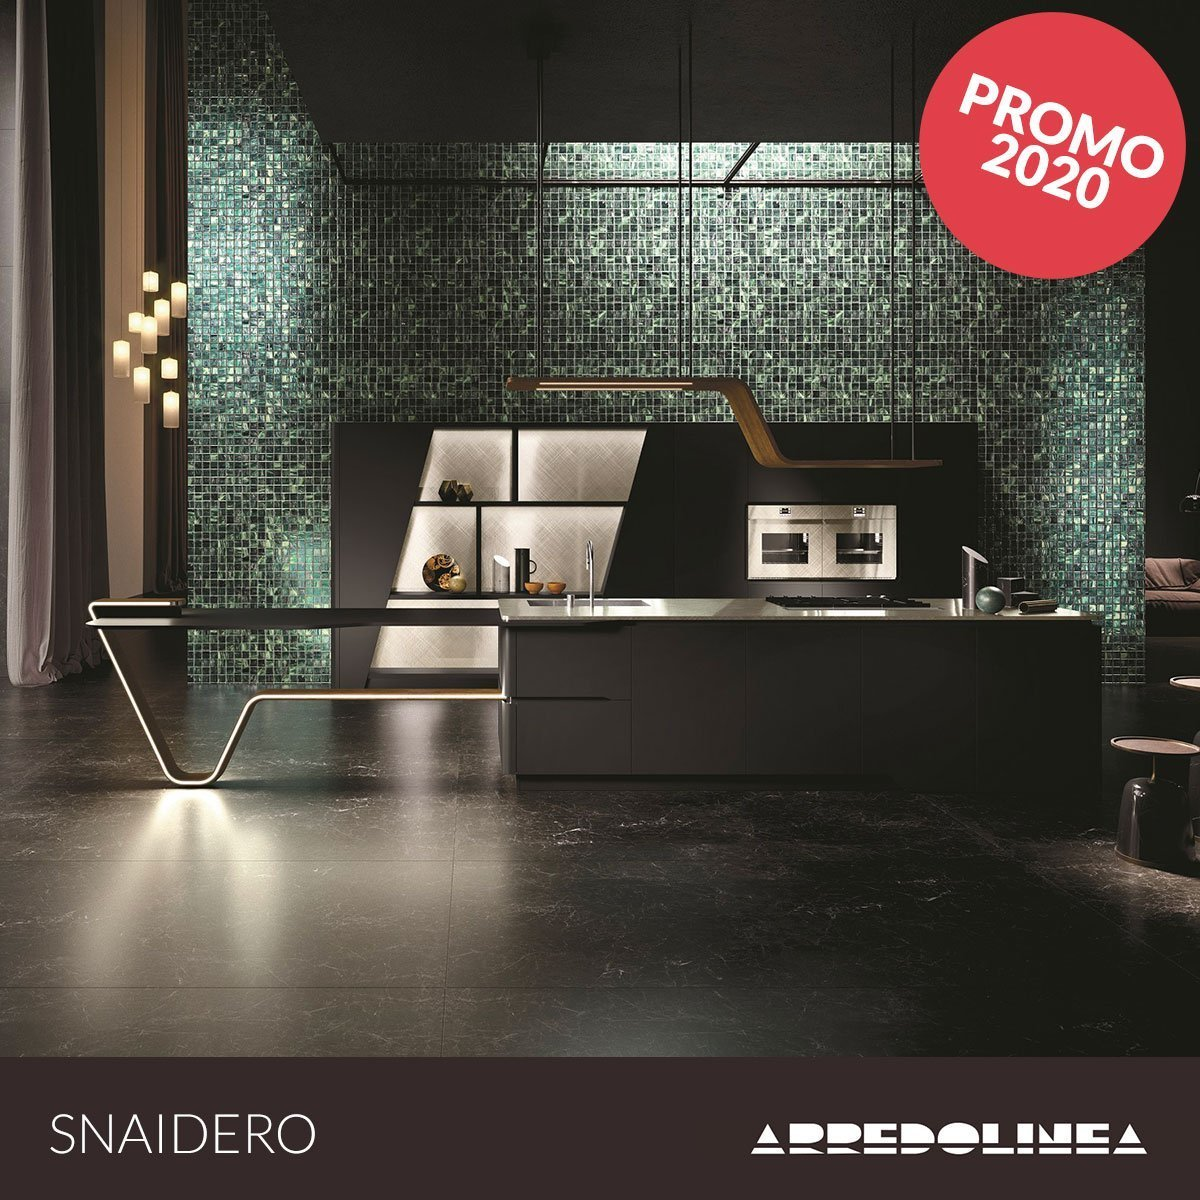 Promo 2020 - Snaidero